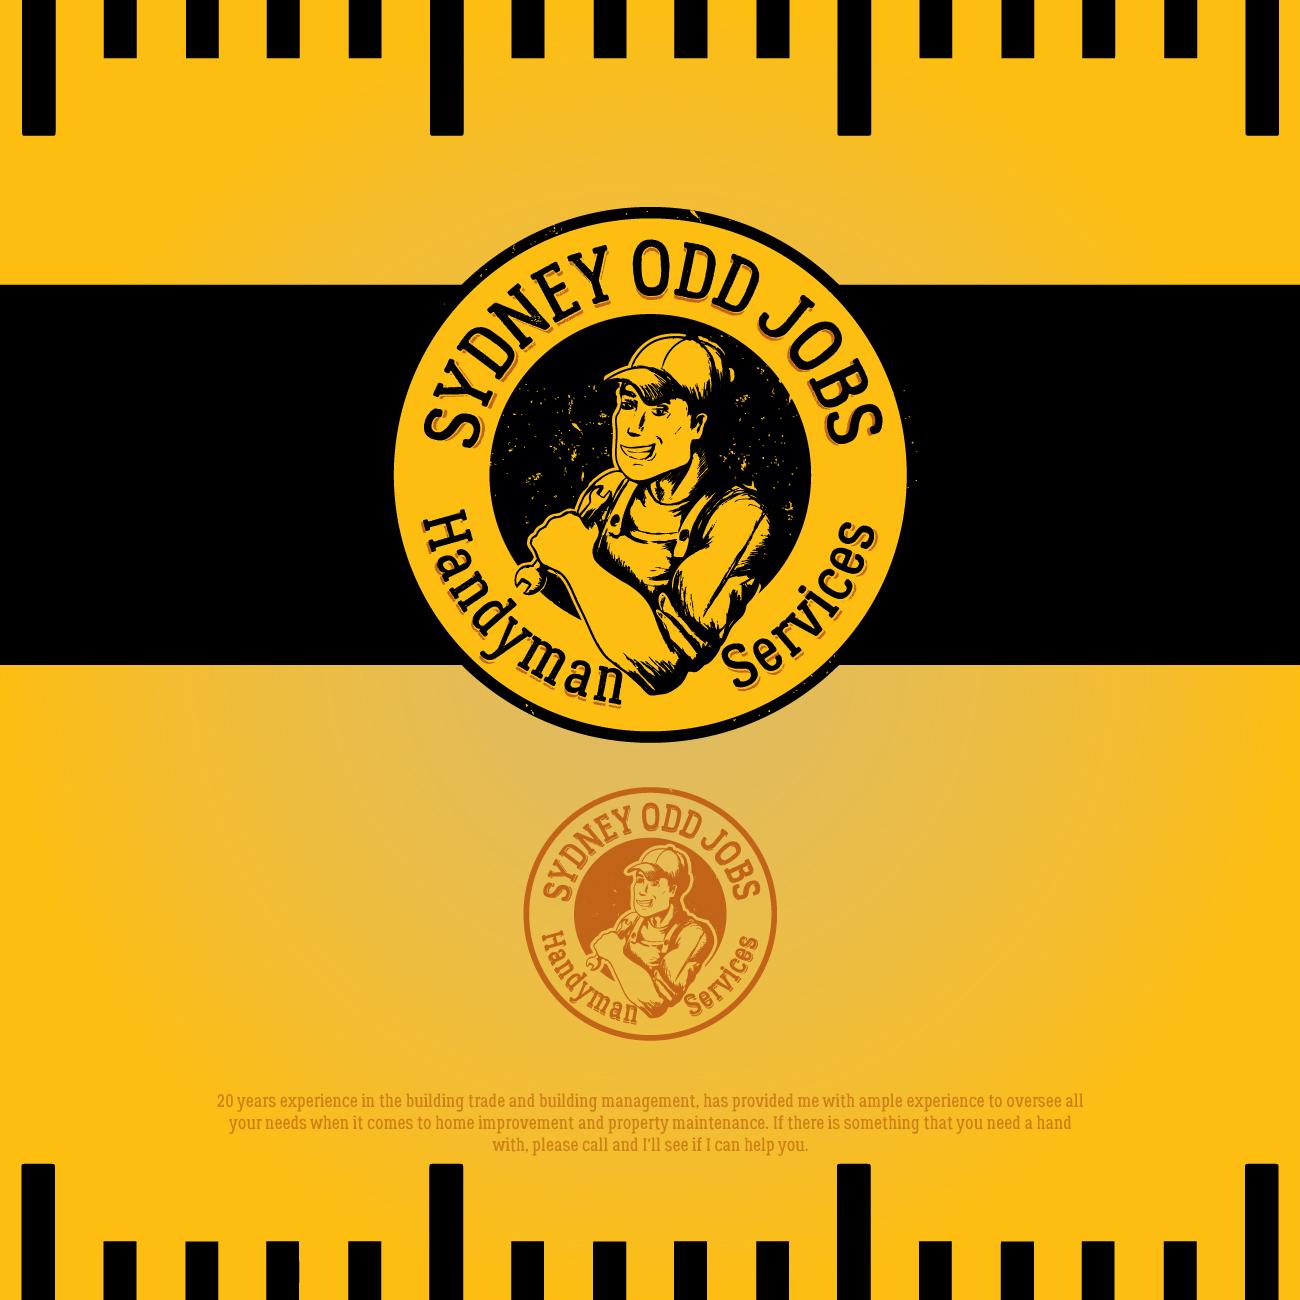 Serious, Masculine, Handyman Logo Design for Sydney Odd Jobs